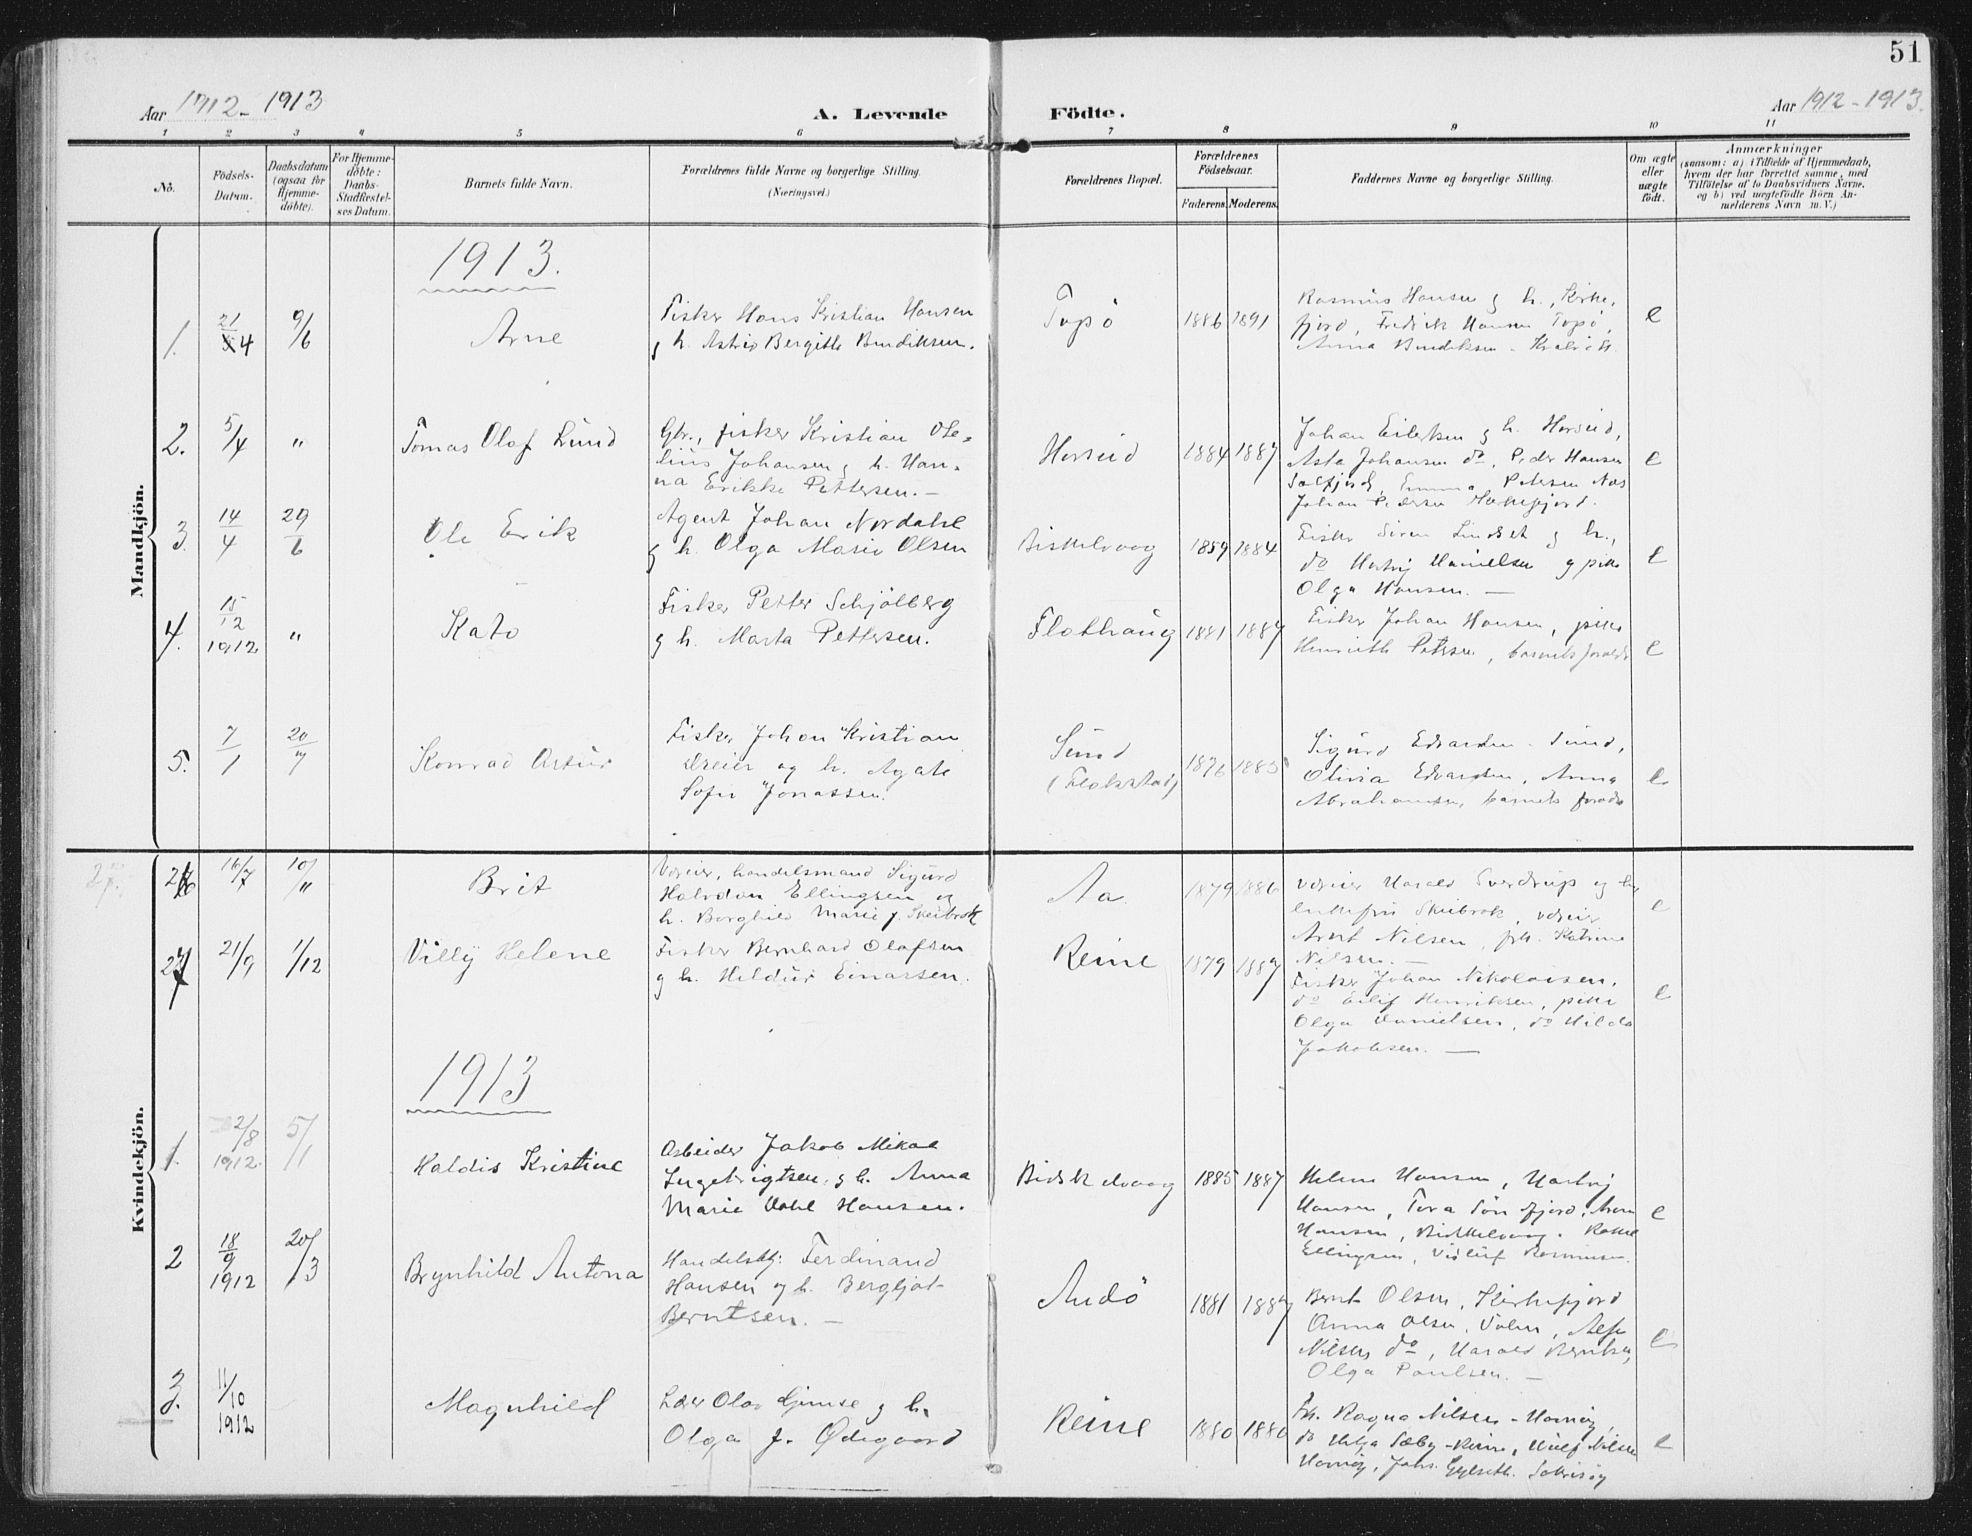 SAT, Ministerialprotokoller, klokkerbøker og fødselsregistre - Nordland, 886/L1221: Ministerialbok nr. 886A03, 1903-1913, s. 51